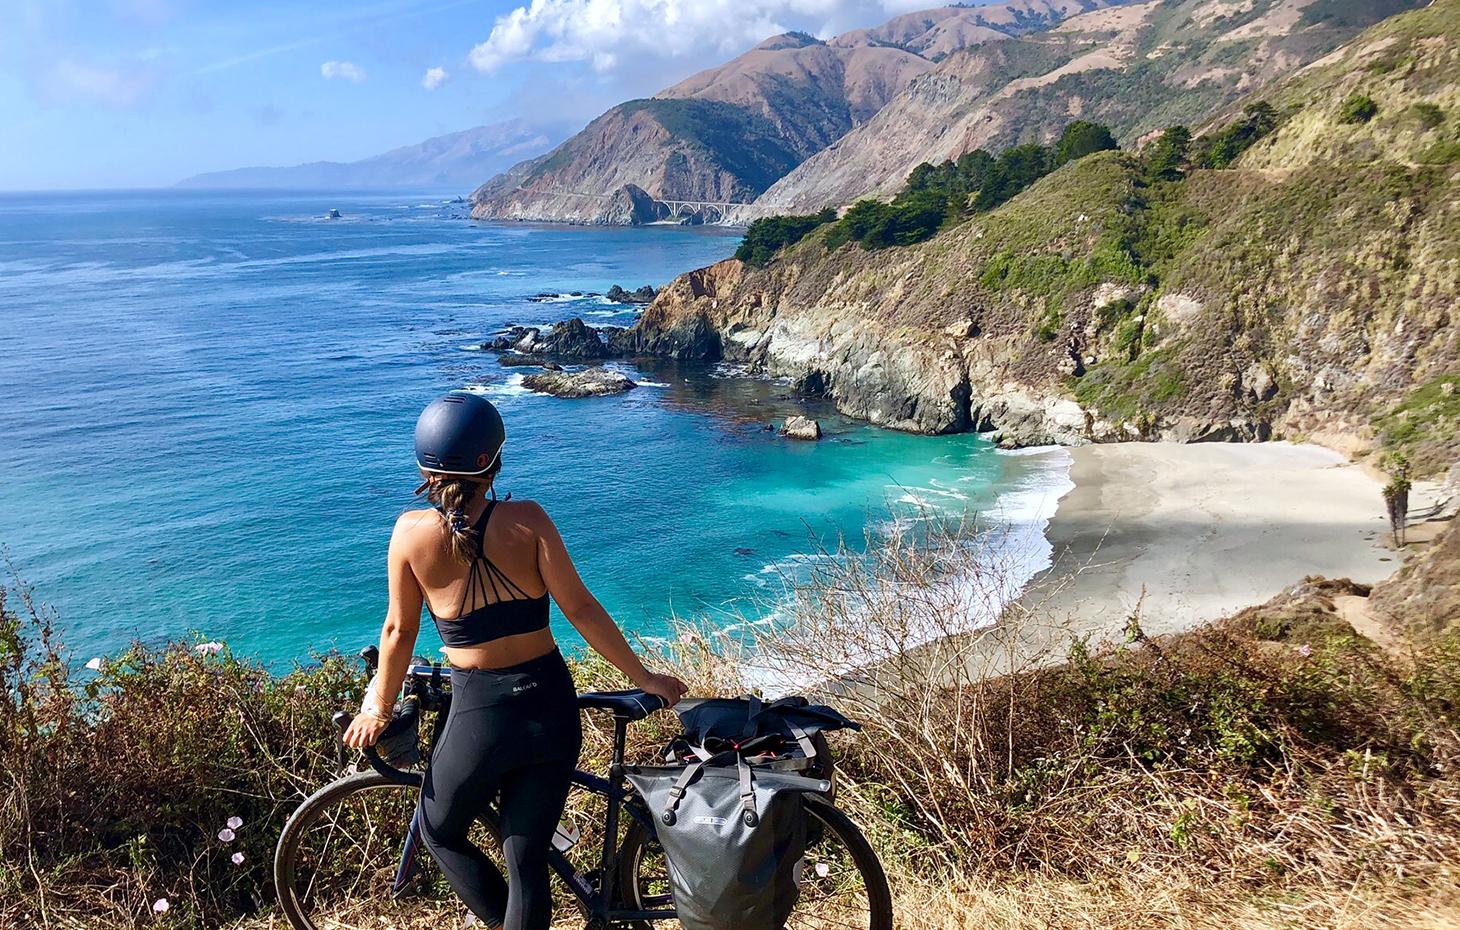 Lauren Hanano wear blue bike helmet